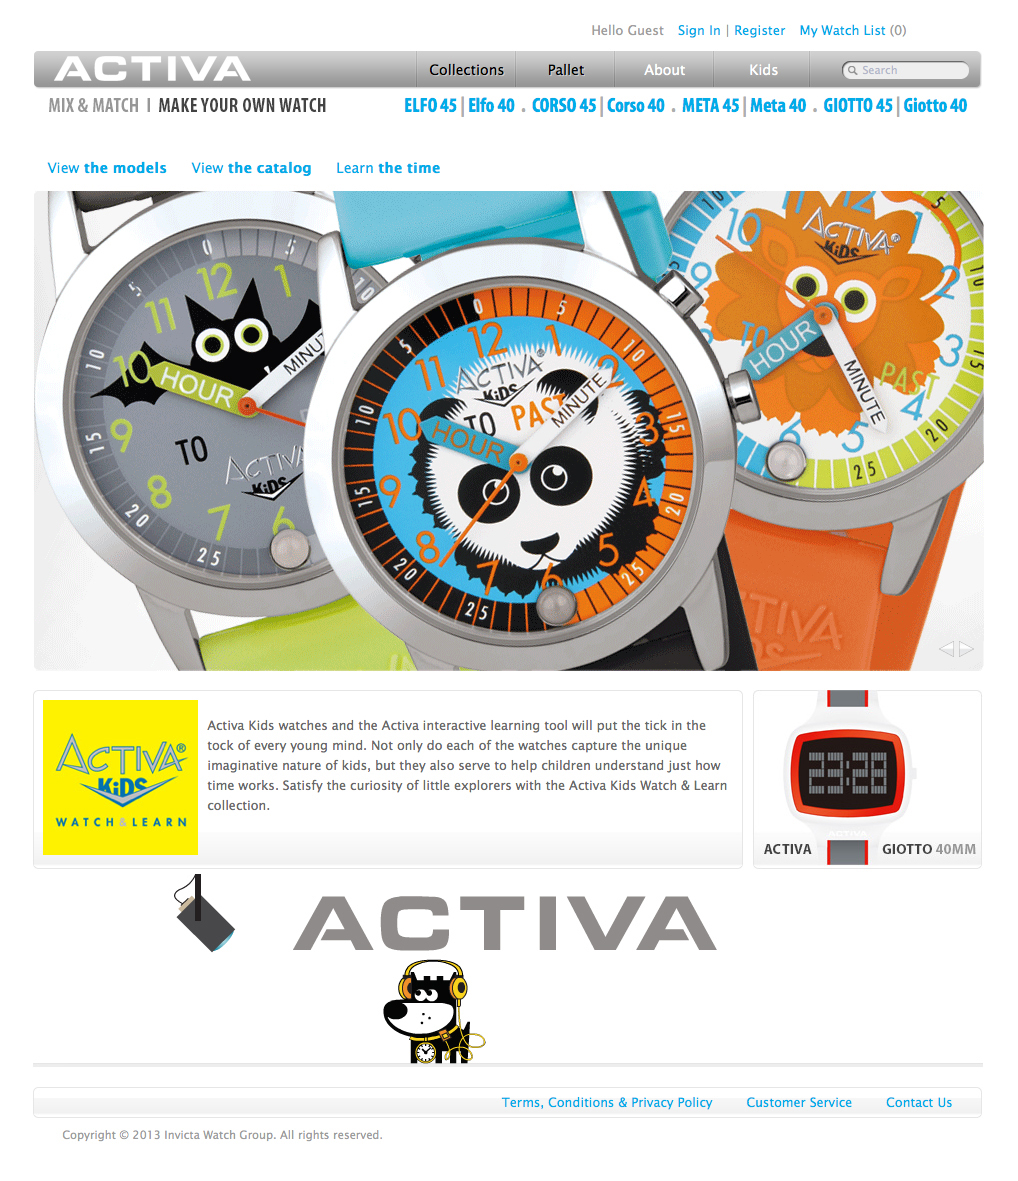 ActivaKidsSite_resized_002.jpg